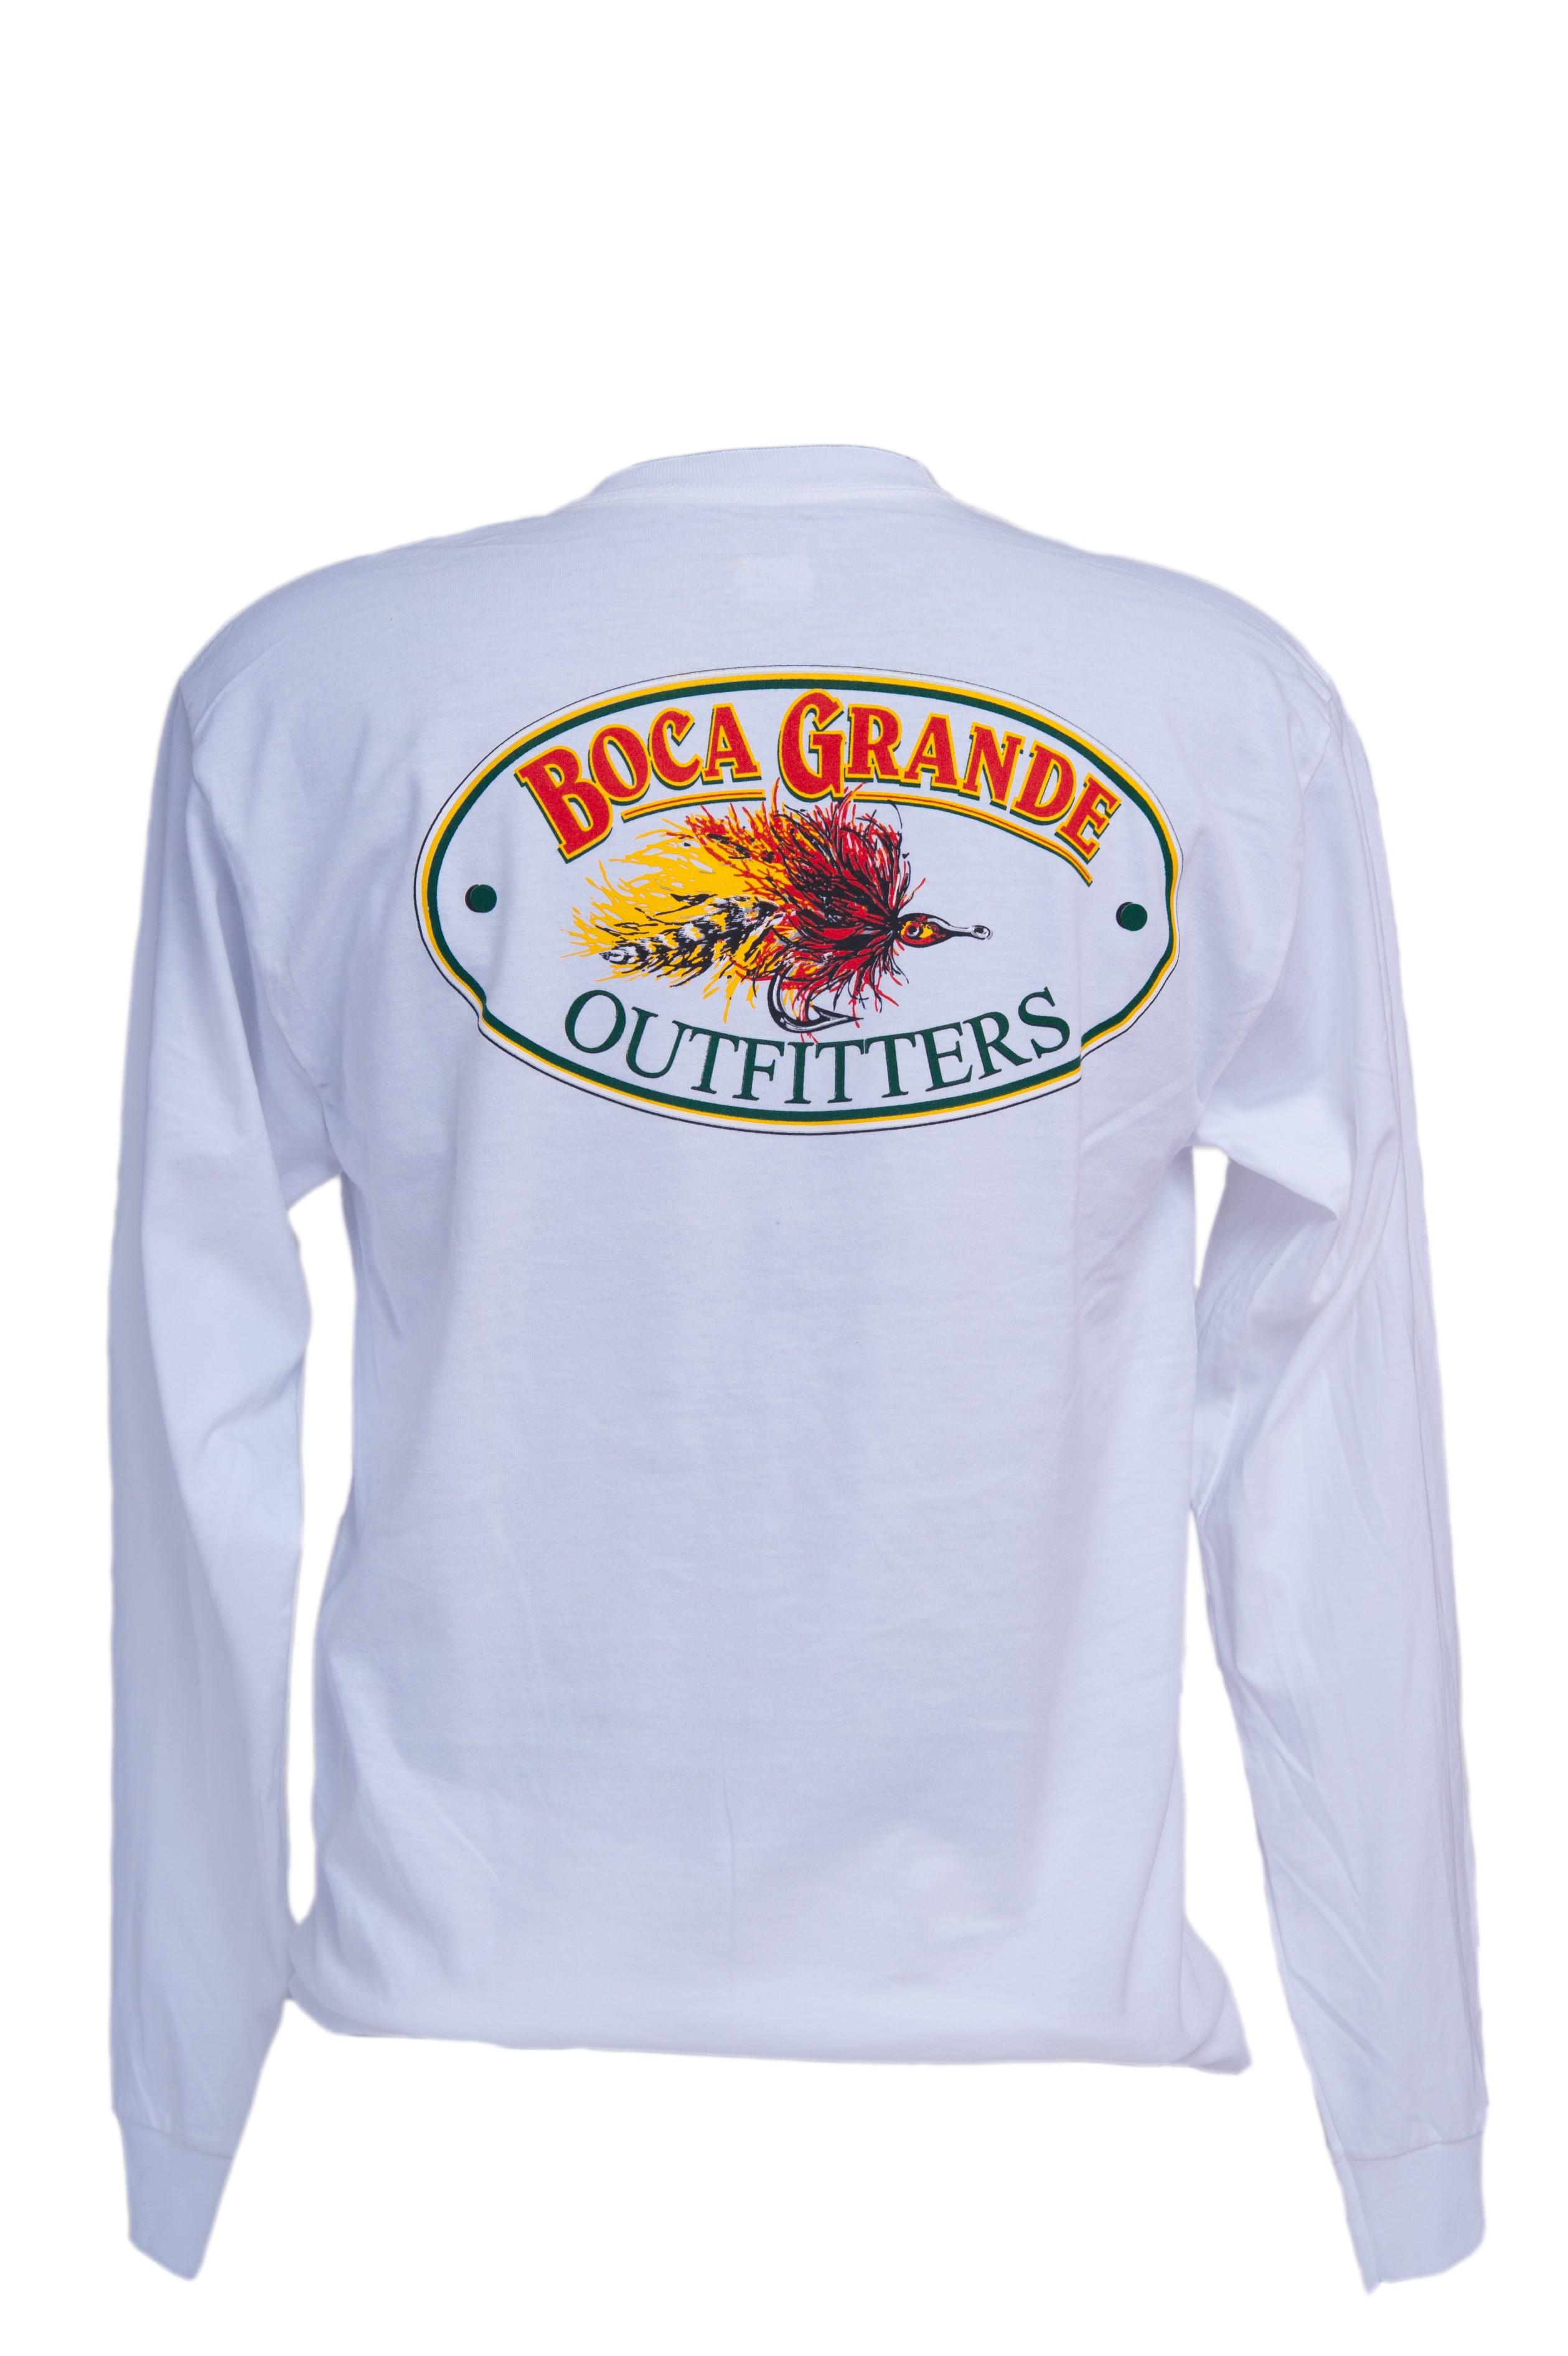 Boca Grande Outfitters Long Sleeved Fly Logo T-Shirt - White